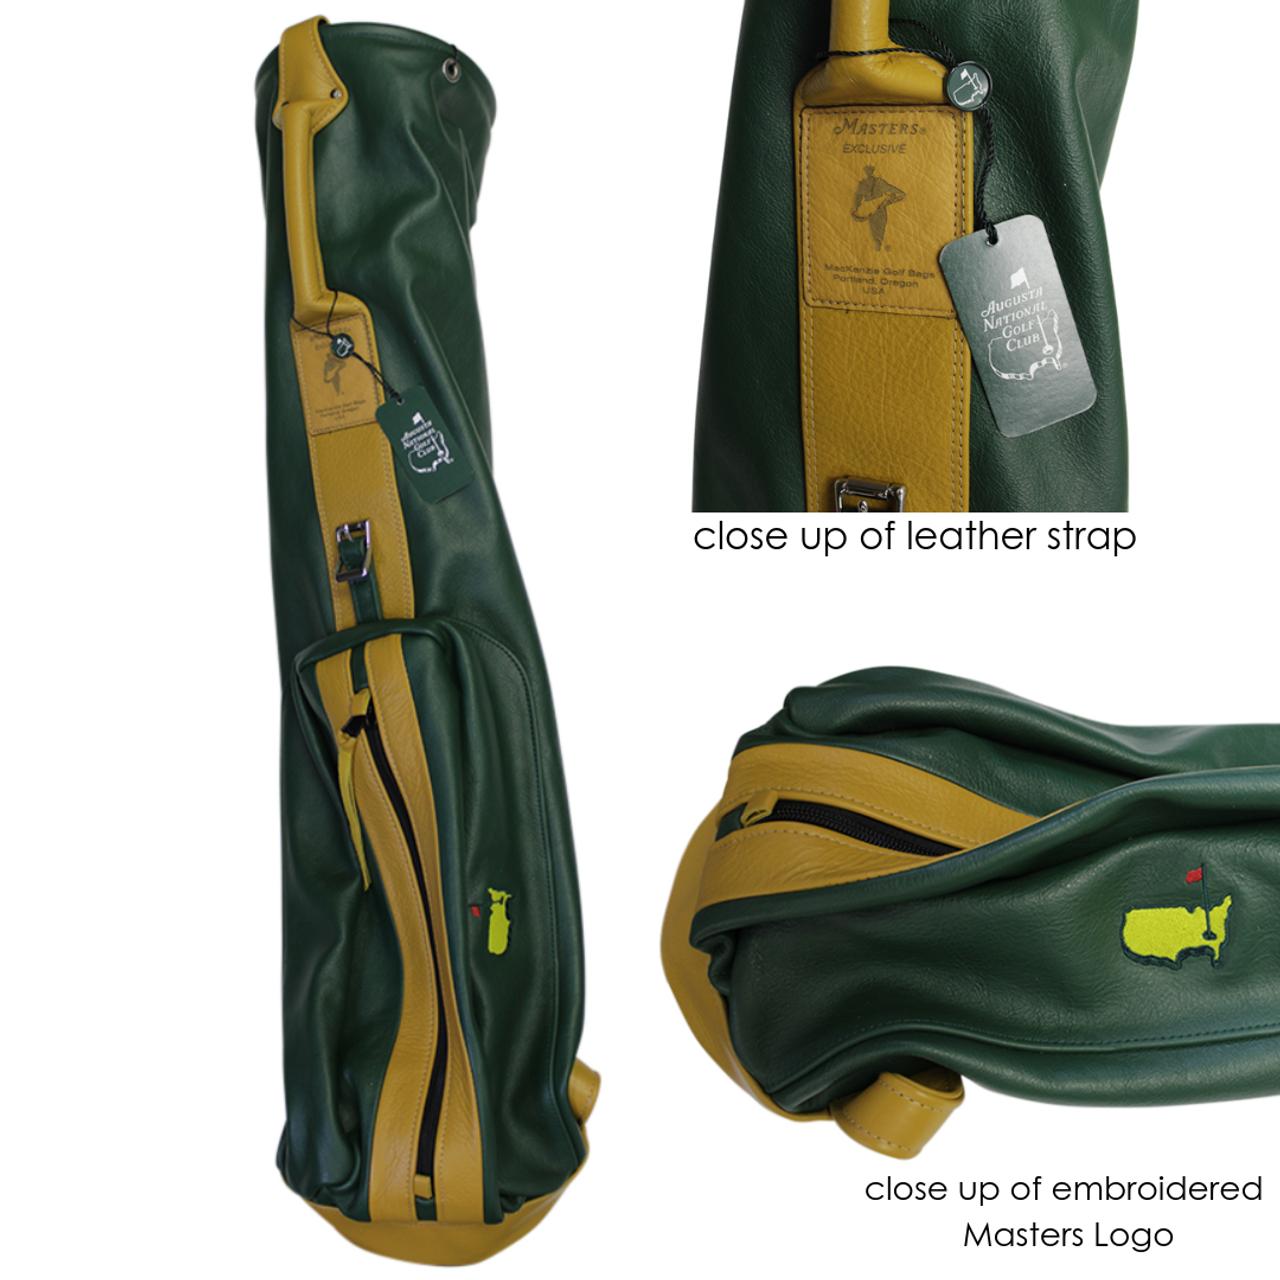 3f3a3508fbc MacKenzie Masters Exclusive Leather Golf Bag